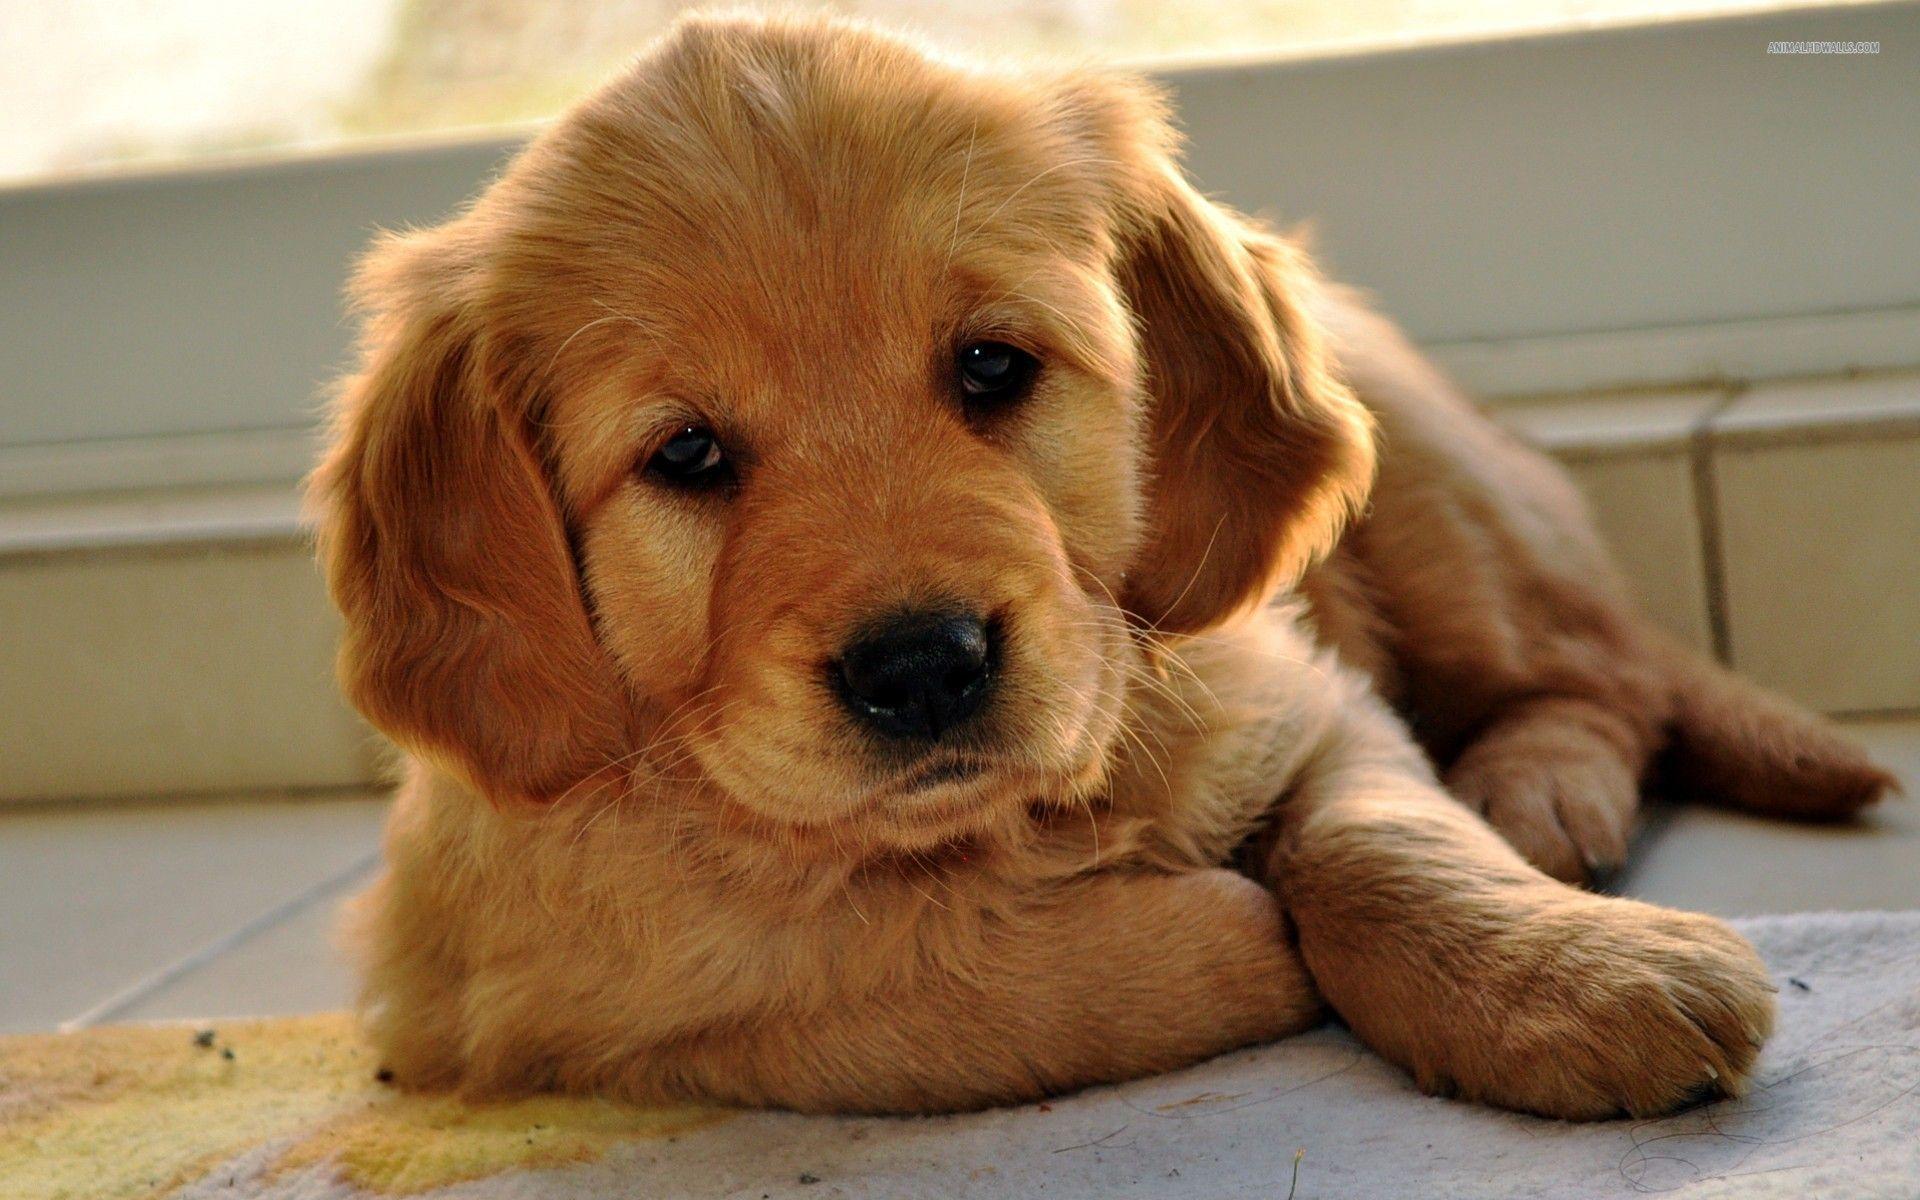 Golden Retriever Puppies Golden Retriever Puppy Wallpaper 1920x1200 Red Golden Retriever Puppy Golden Retriever Puppy Golden Retriever